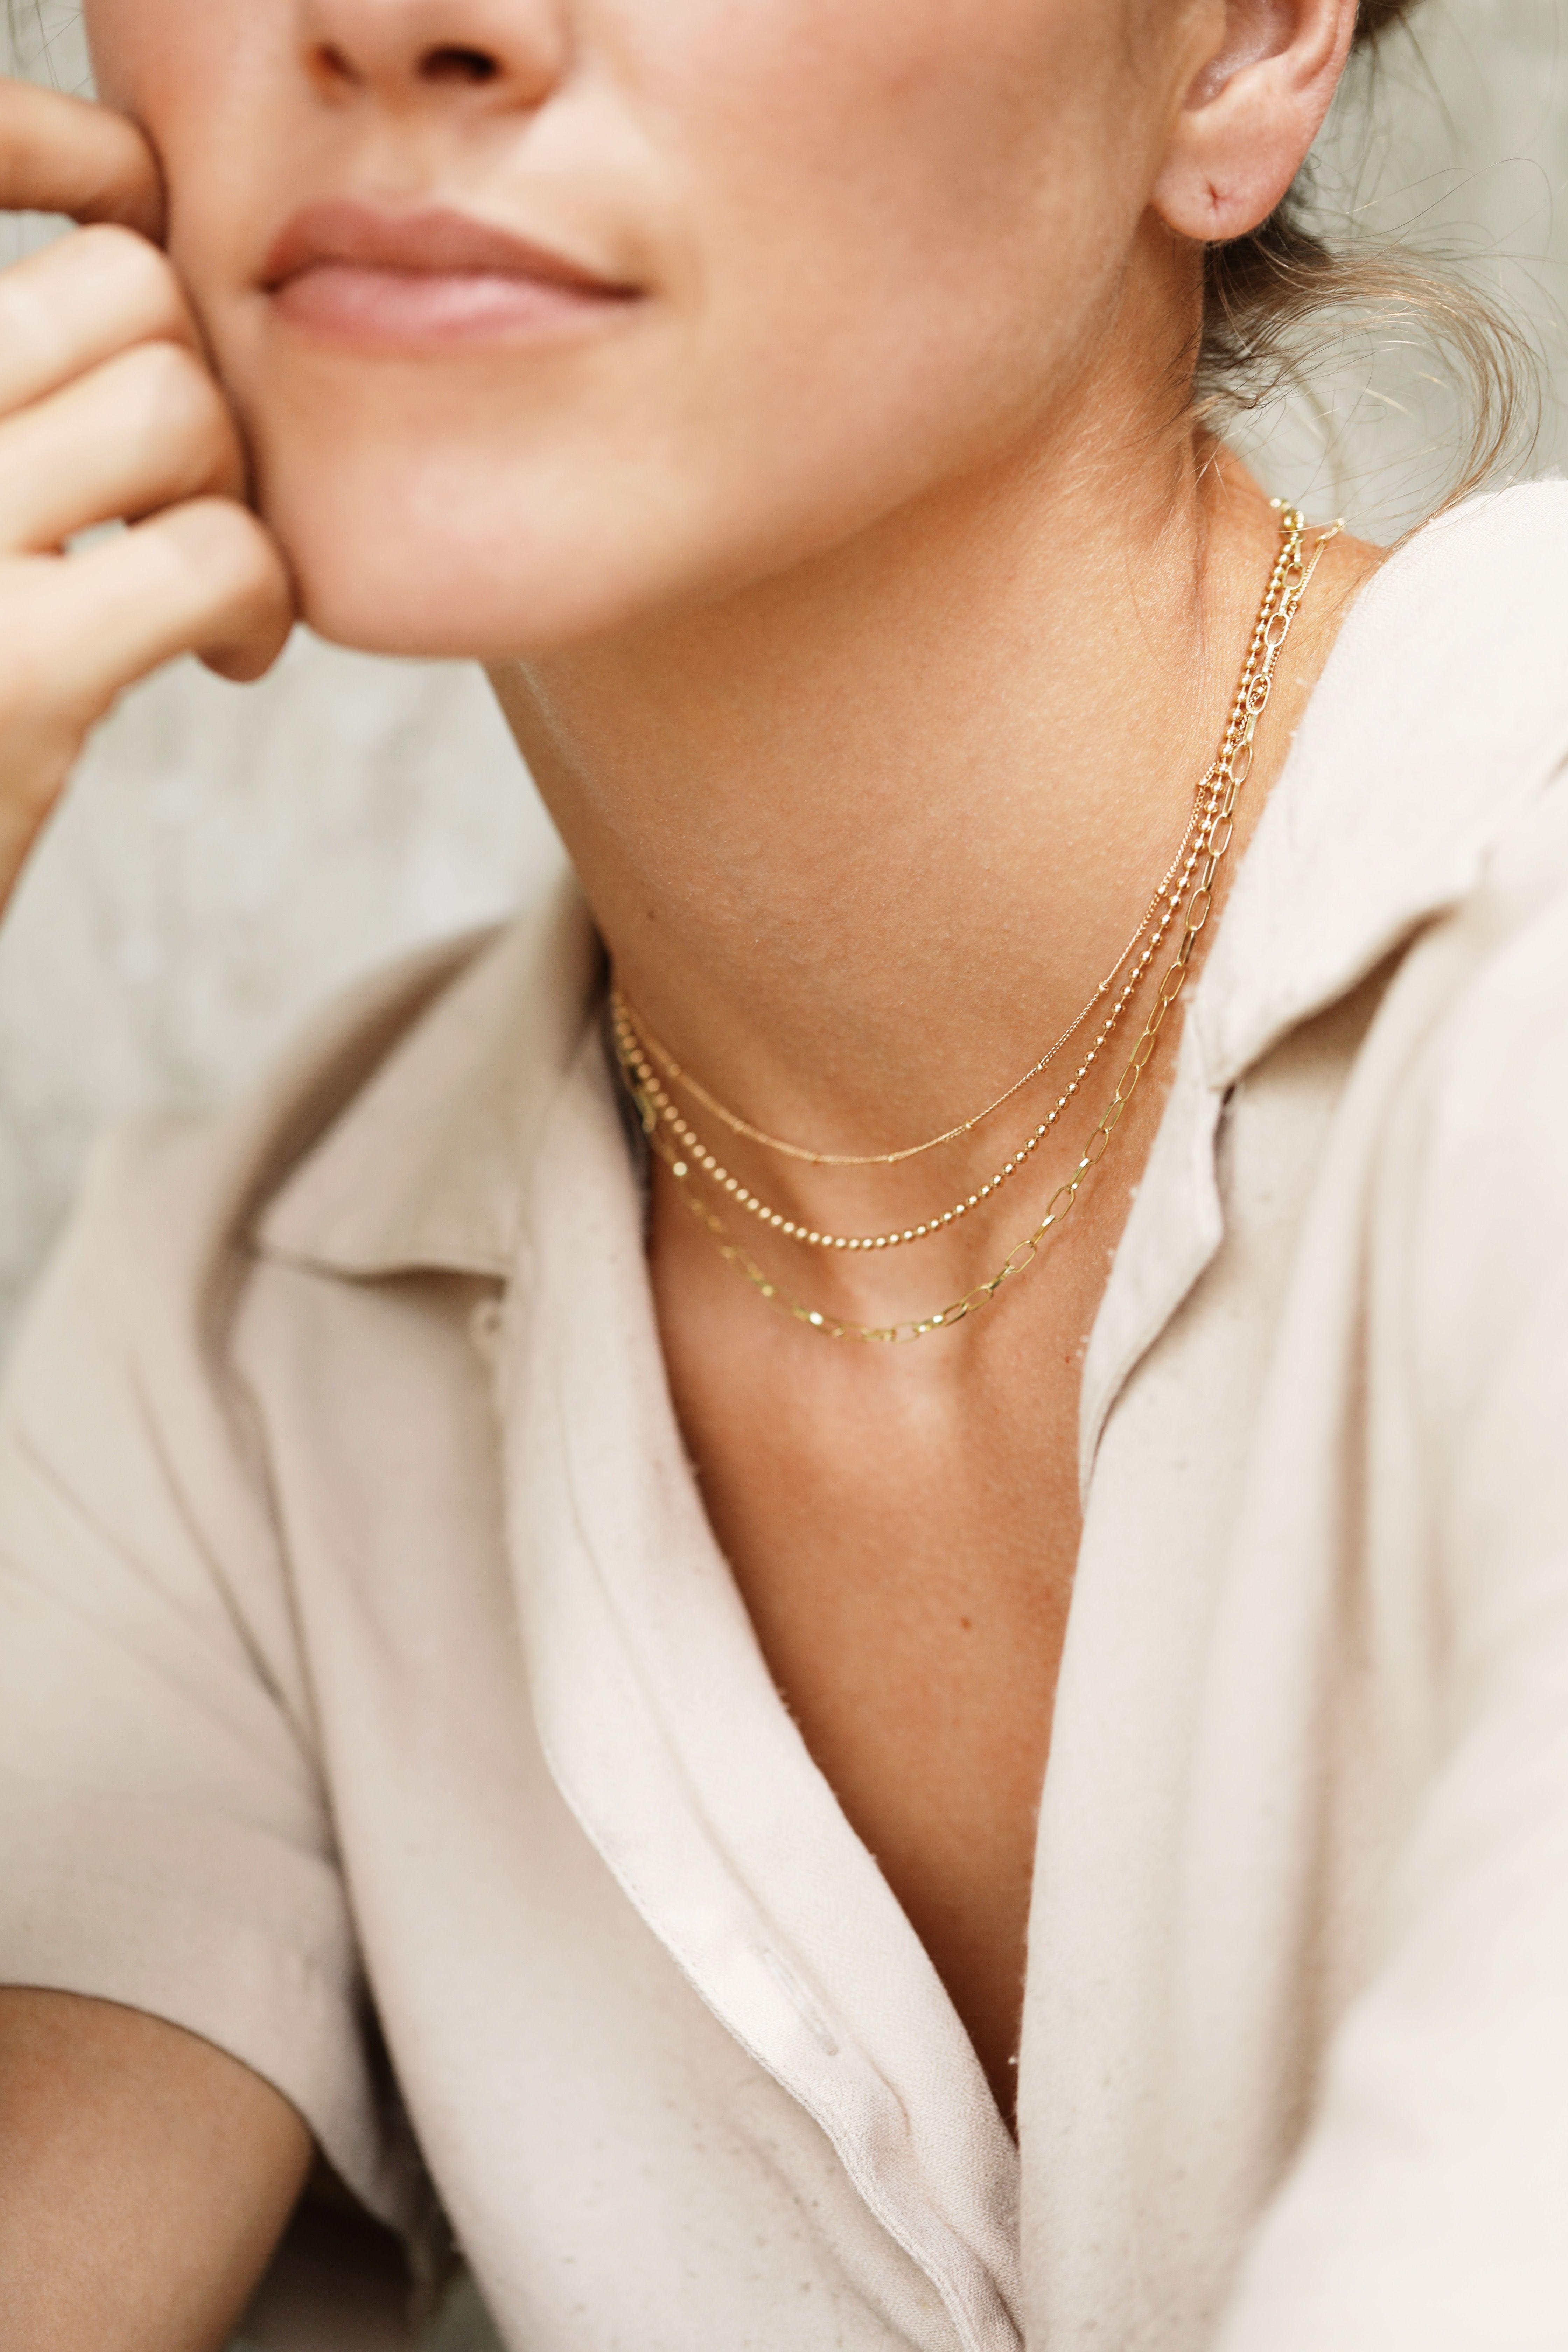 Long leaf pendant necklace boho necklace layering necklace layered gold chain necklace long gold chain necklace oak leaf necklace